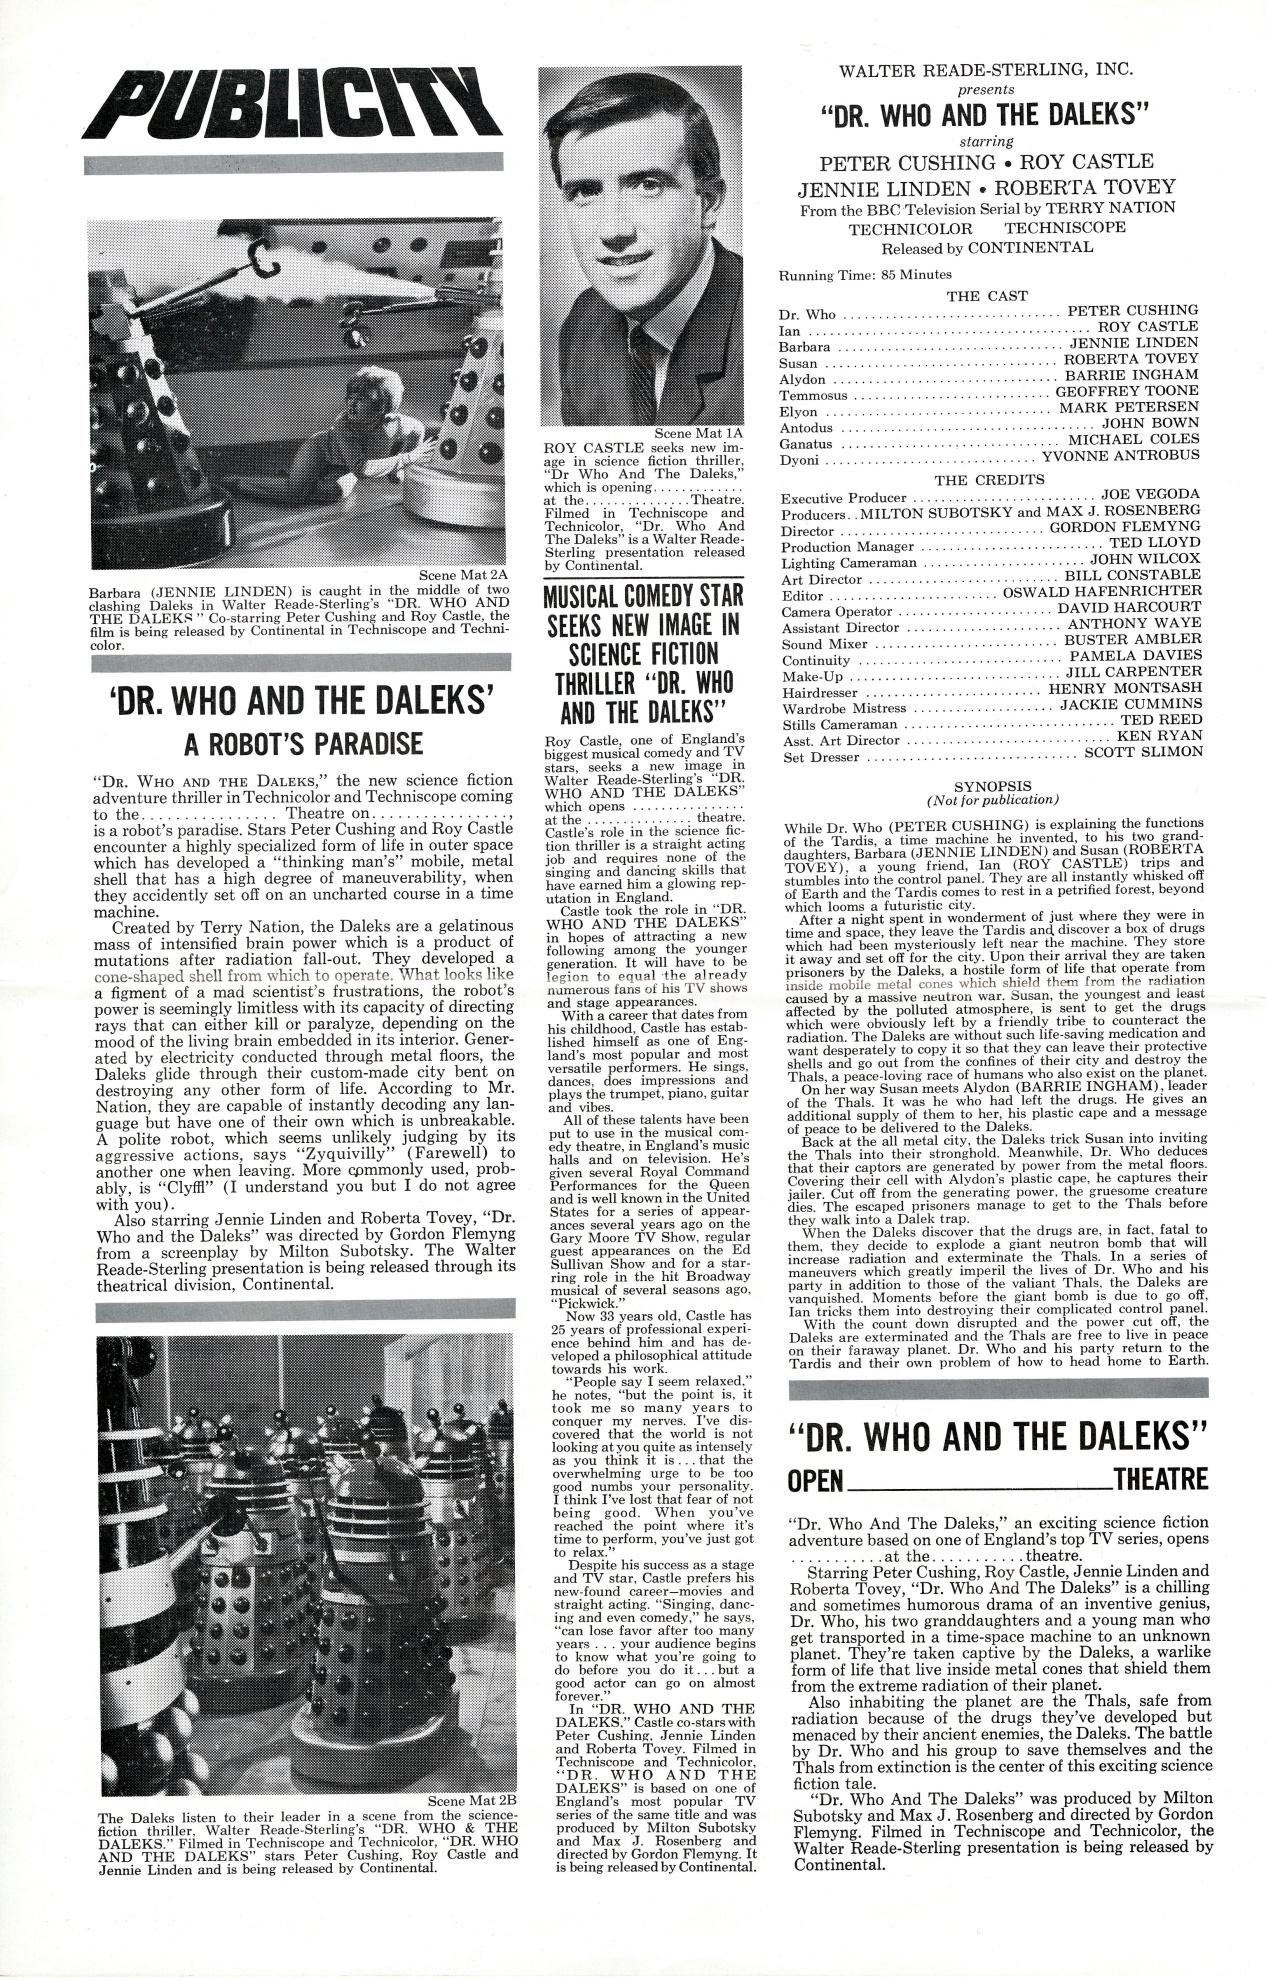 Continental Showmanship Press Book p.2, USA